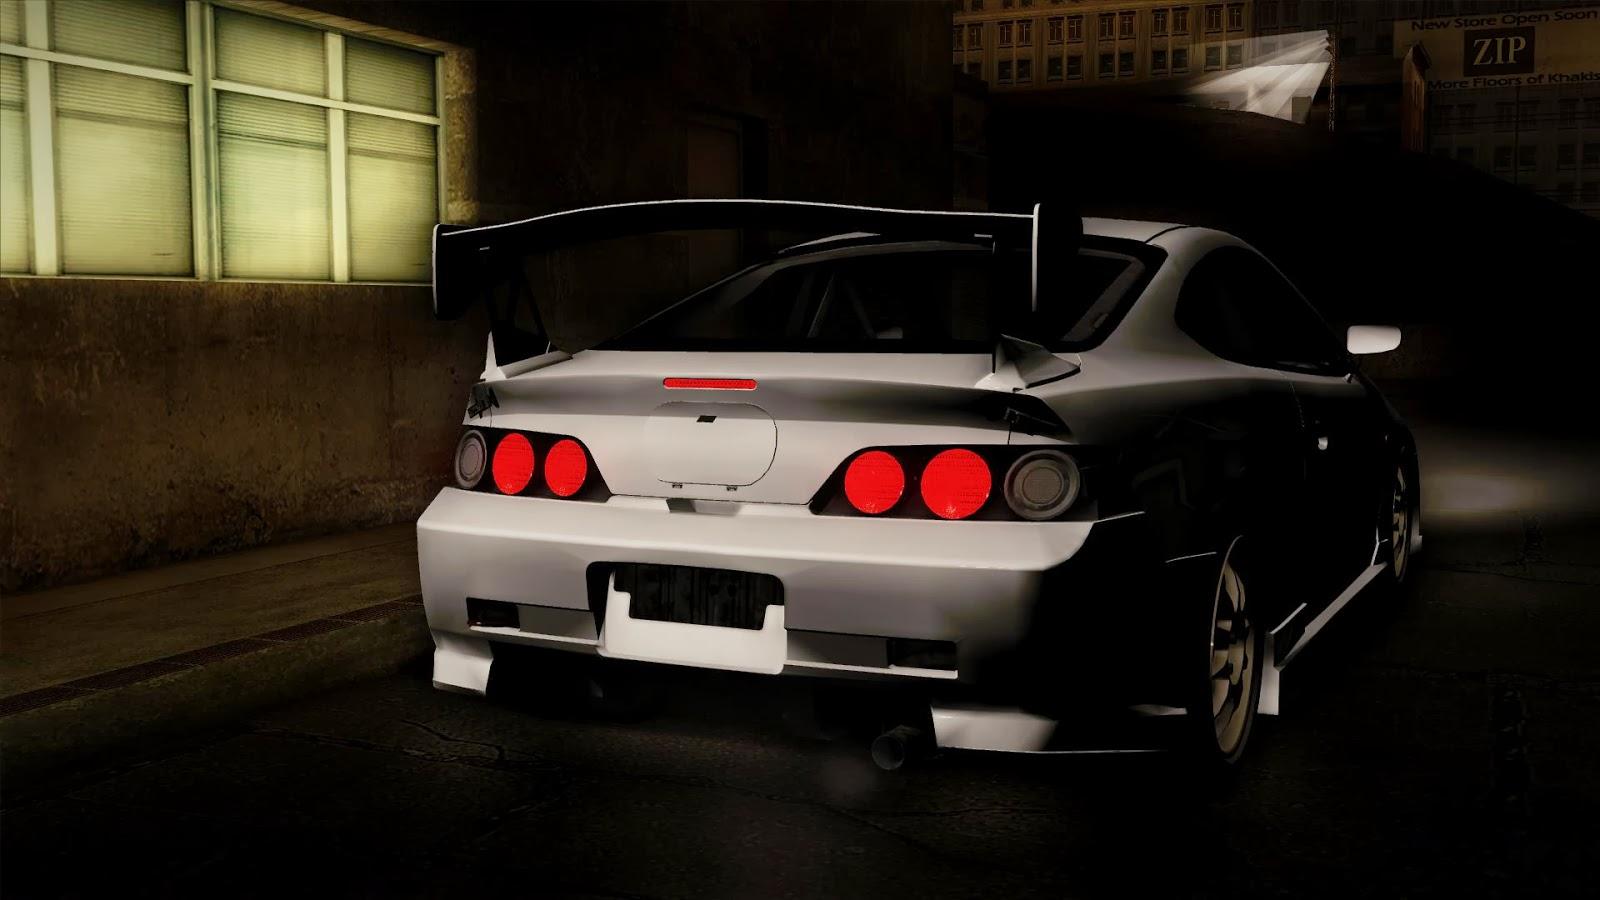 http://2.bp.blogspot.com/-eom9FN_lxhI/Ut5d_2Uh9_I/AAAAAAAABeY/XyLYcvpUwtw/s1600/Honda+Integra+11.jpg